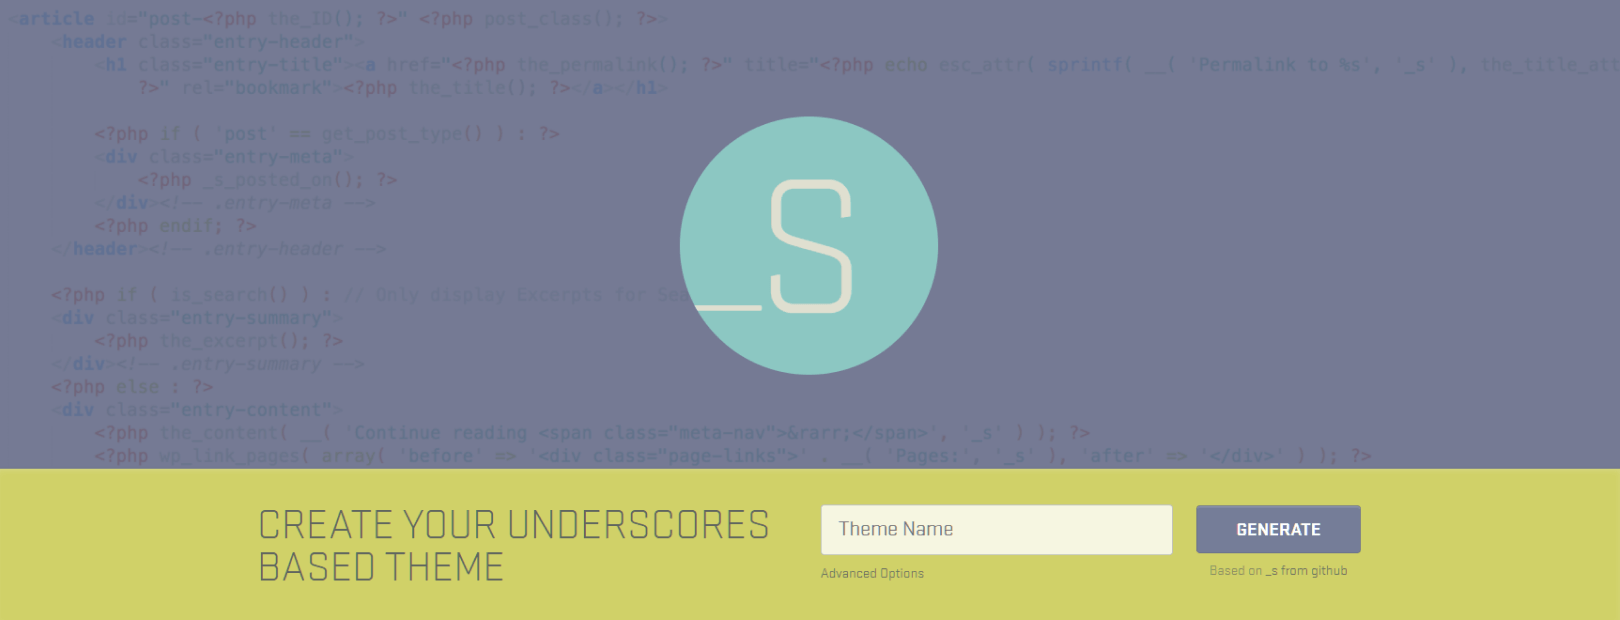 Creating a WordPress Design from Starter Theme